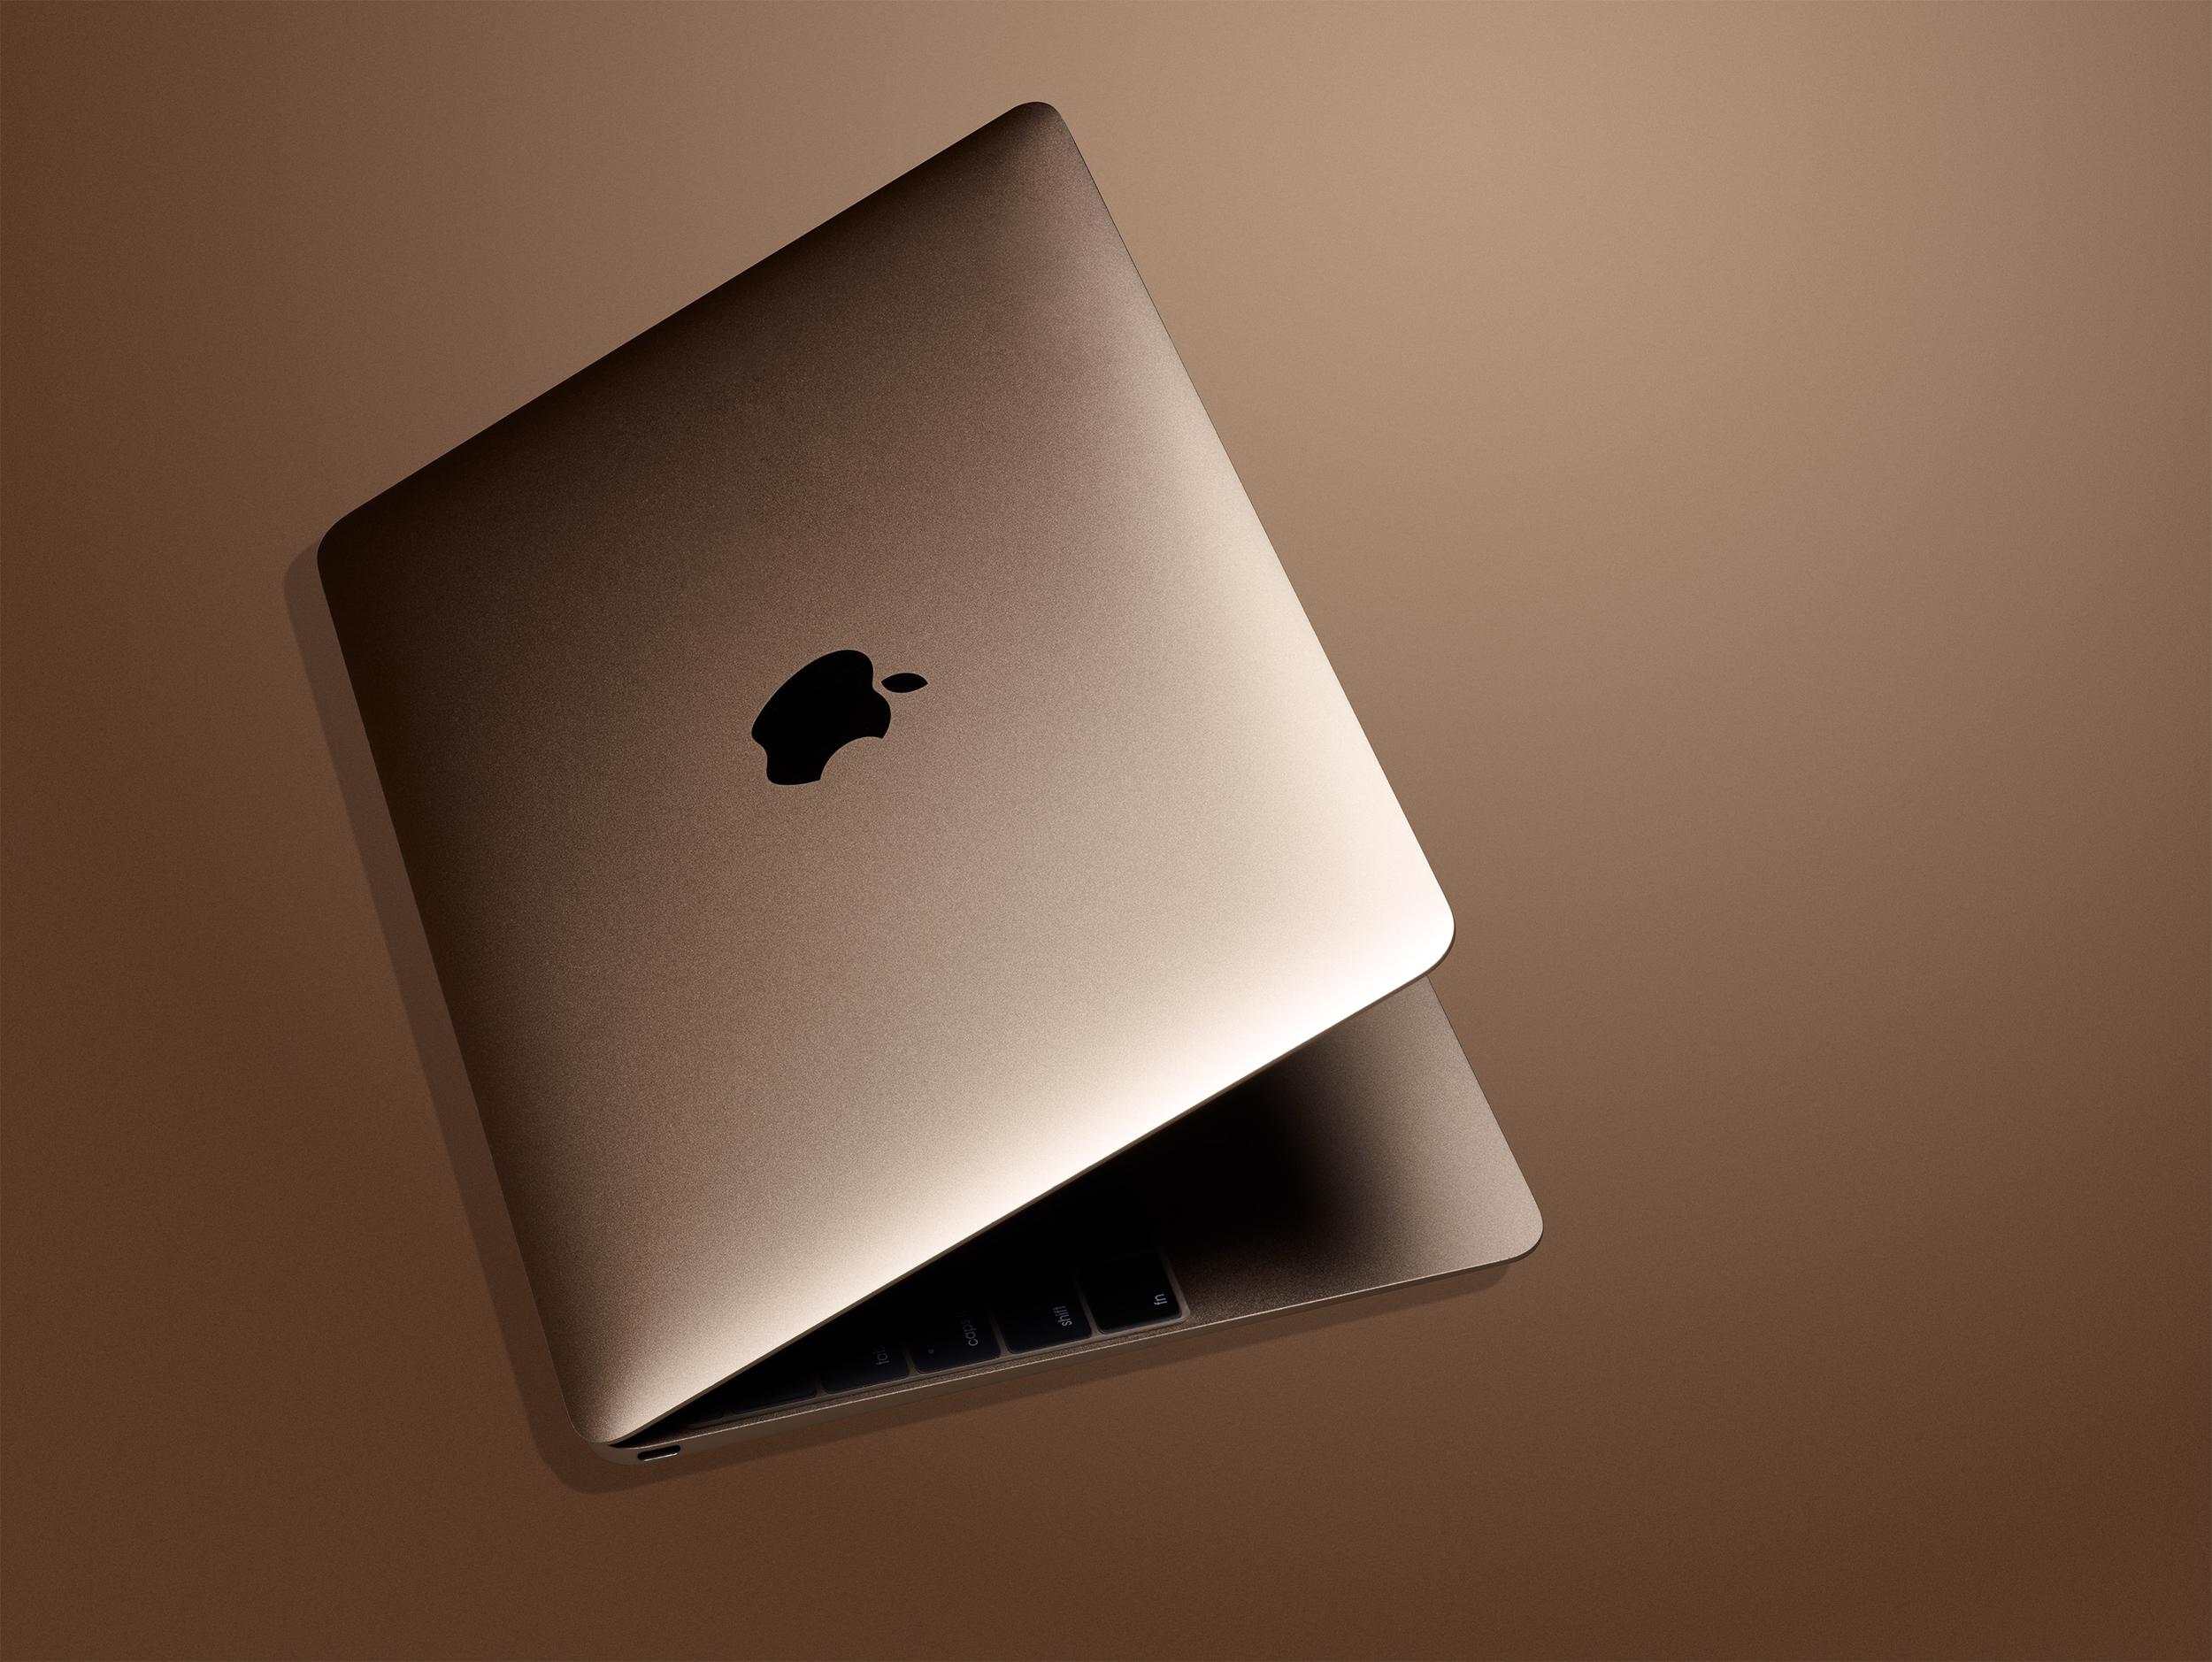 Gold Apple laptop computer on golden background